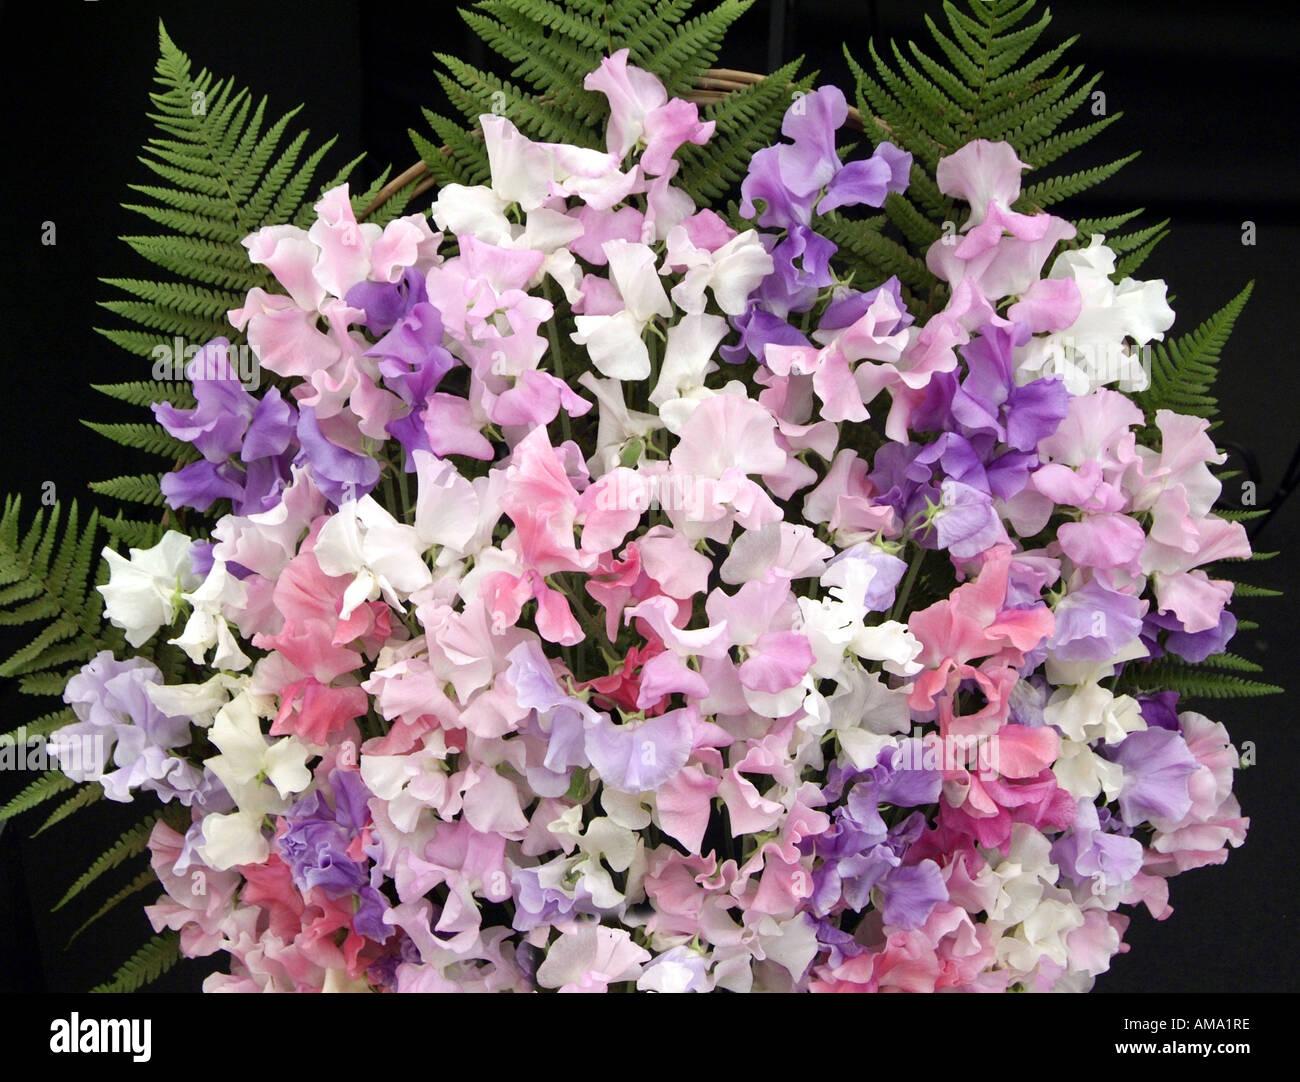 Haufen Masse lila weiß rosa lila gemischt Erbse jährliche Platterbse man Stockfoto